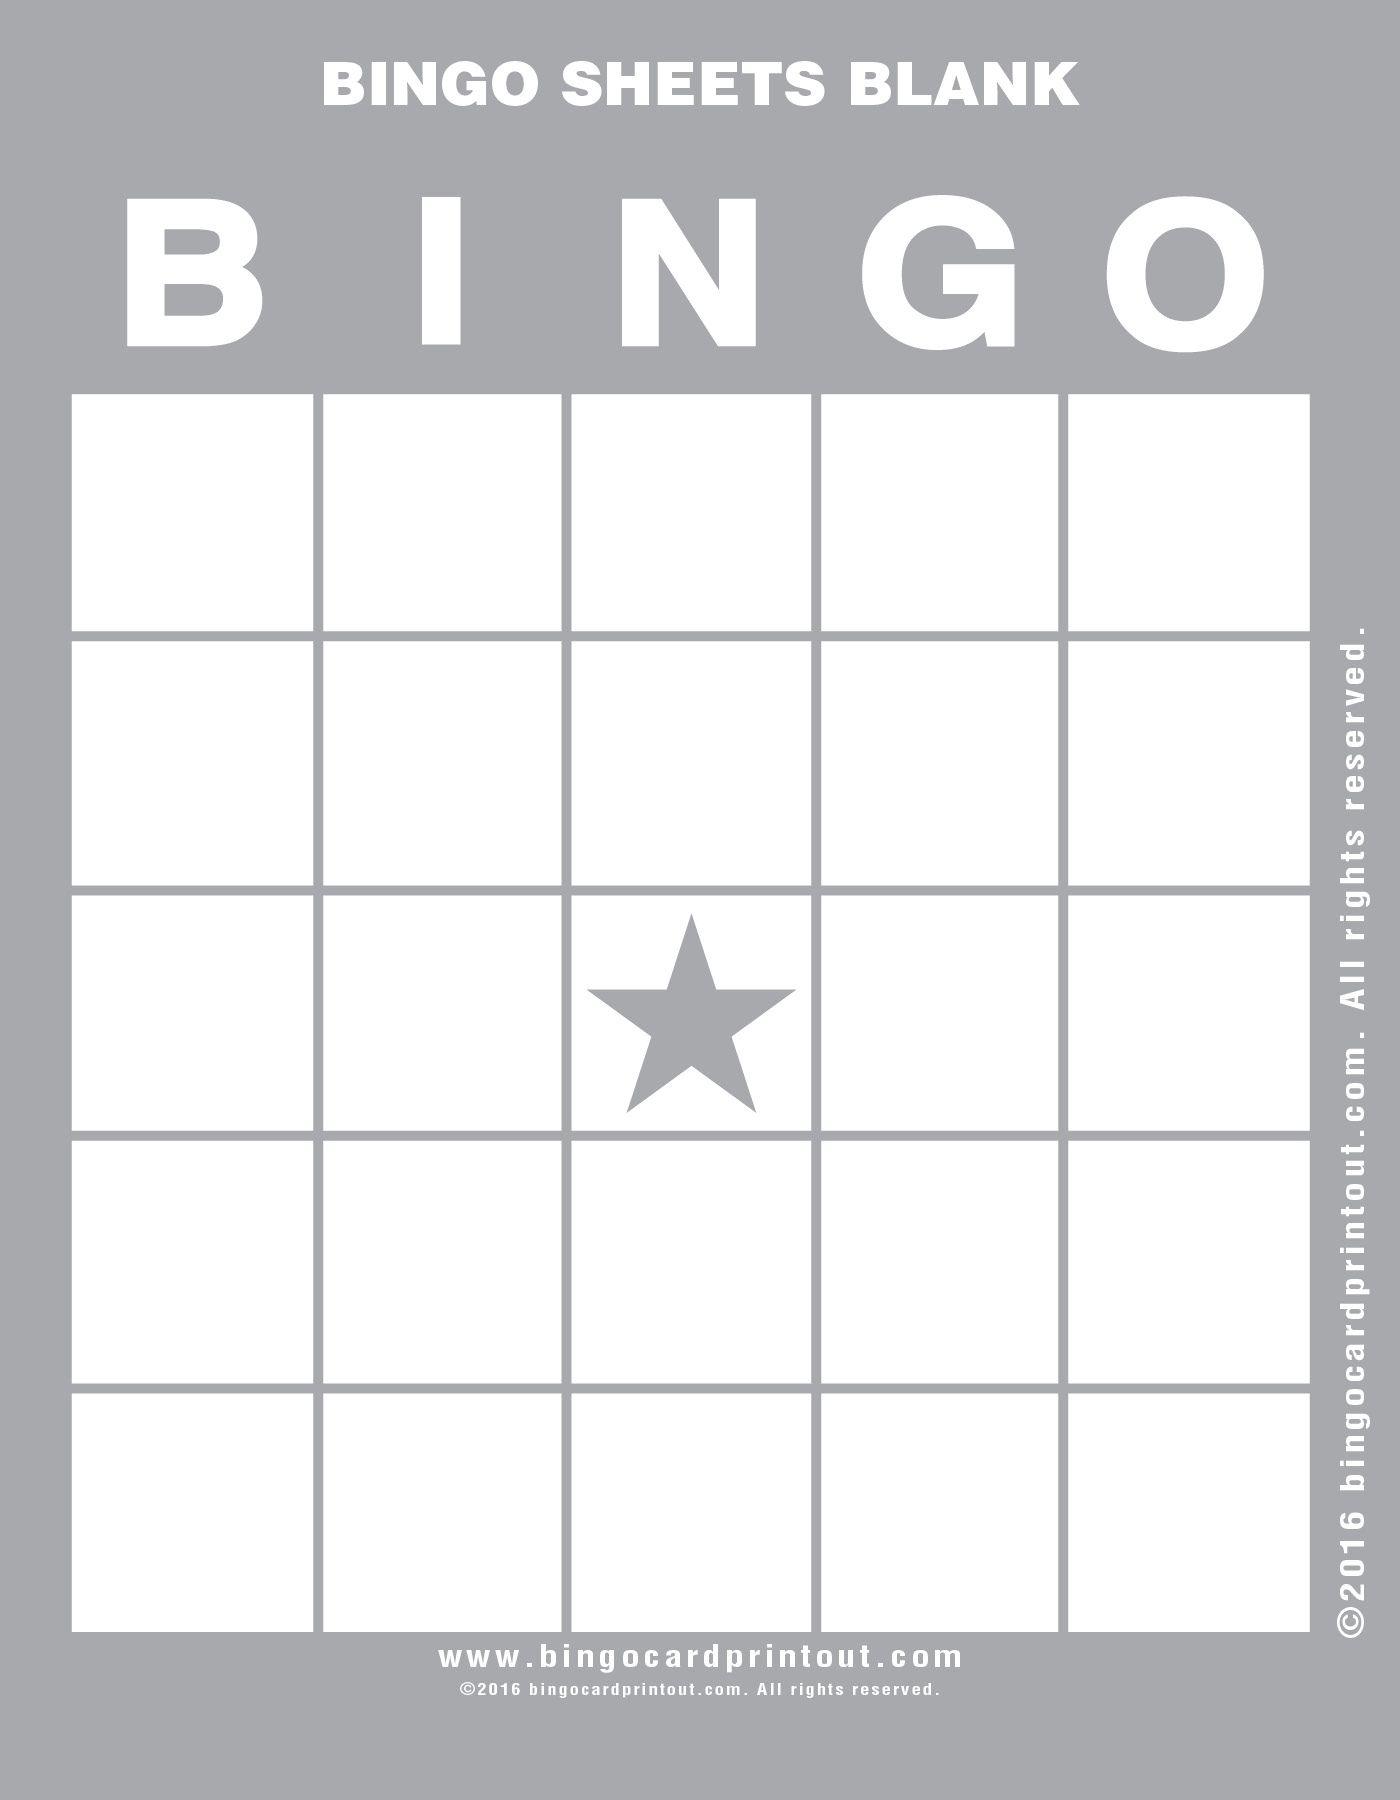 Bingo Sheets Blank Bingocardprintout Com Bingo Sheets Bingo Card Template Free Bingo Cards